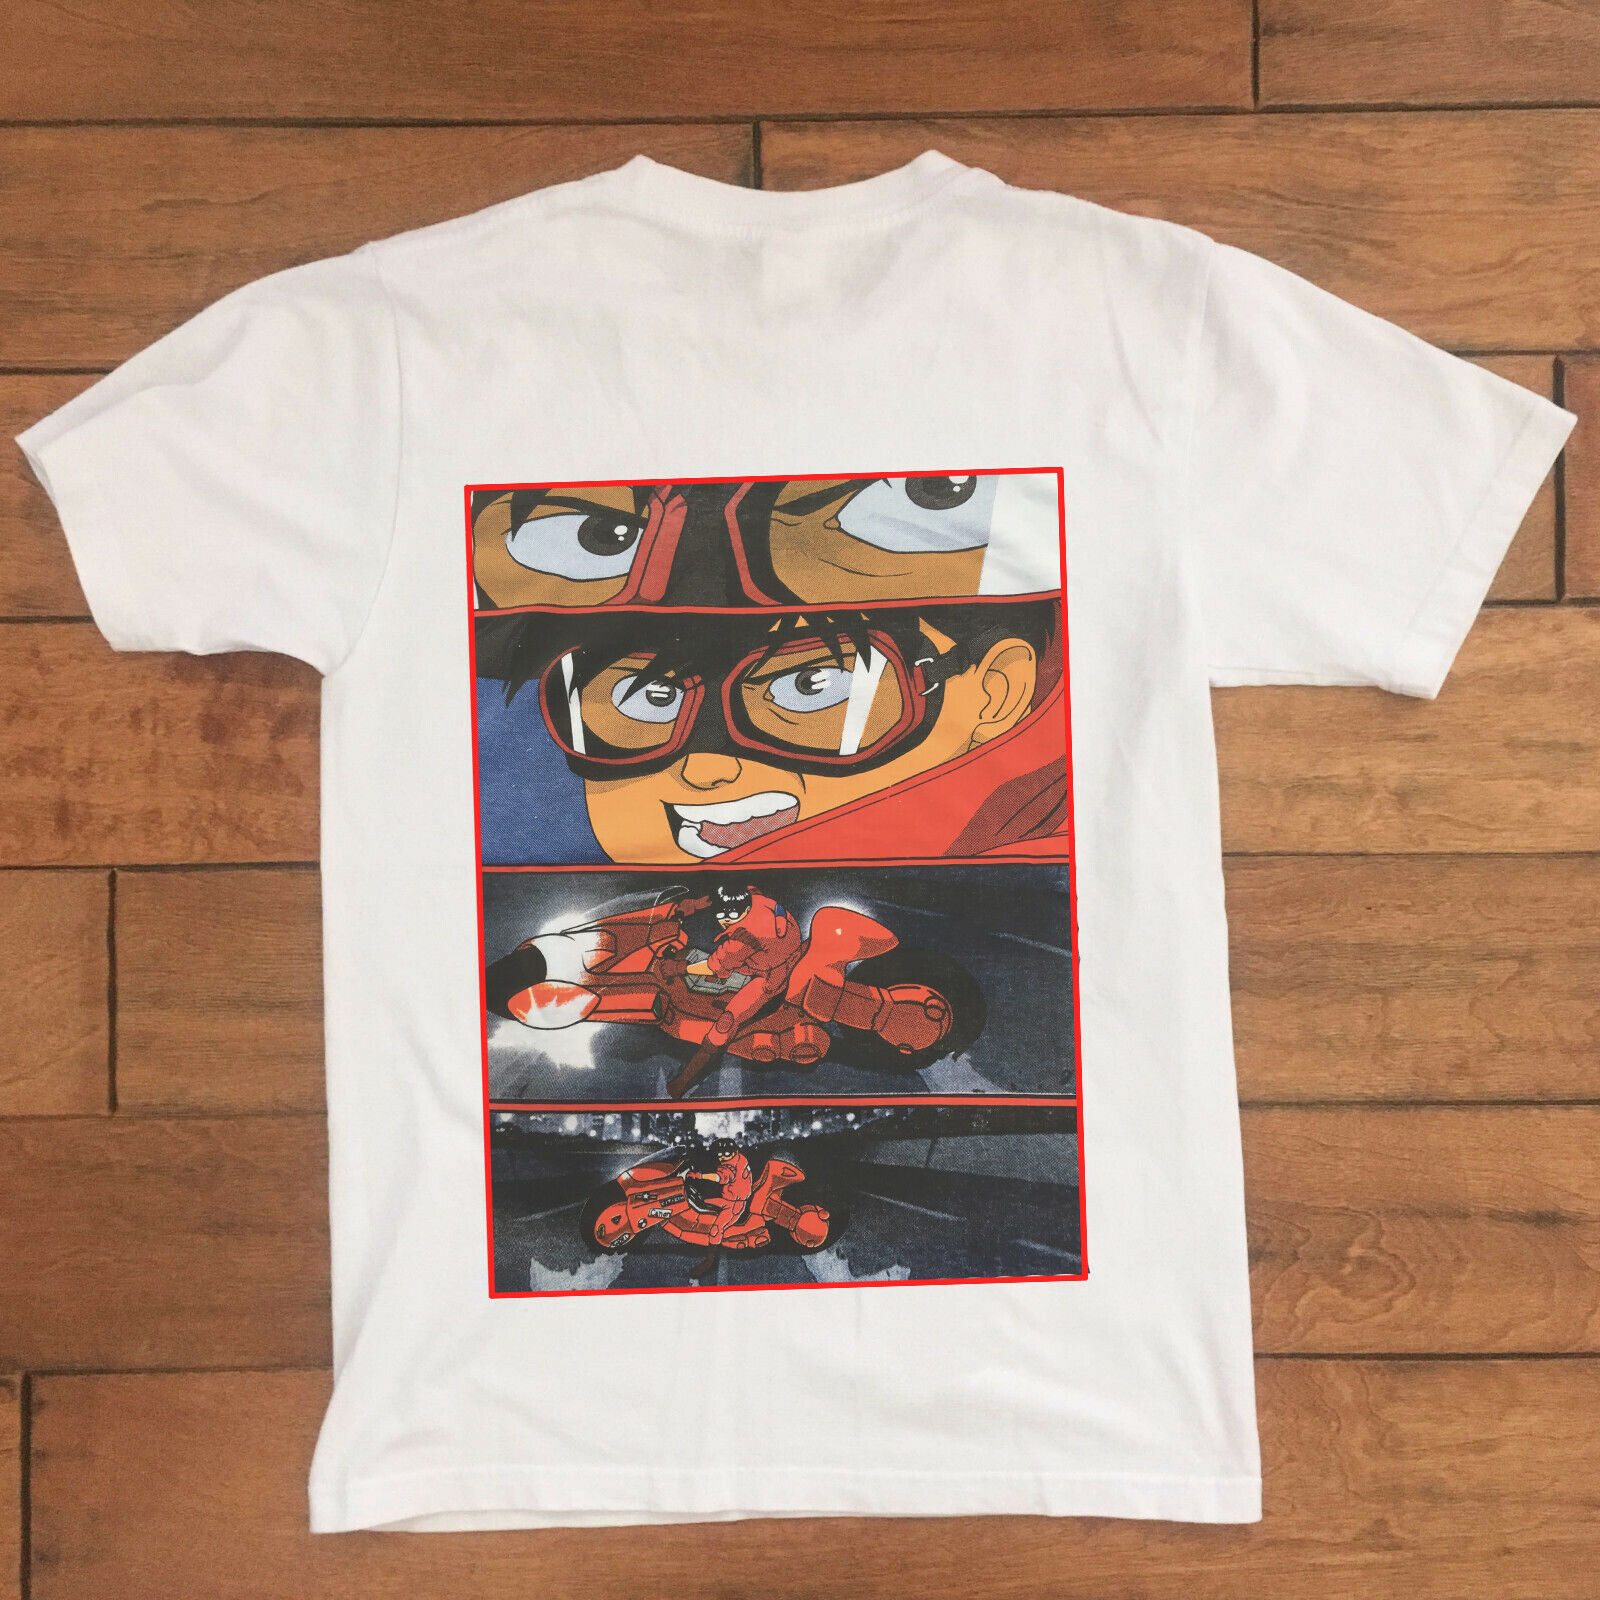 Vtg Akira Double Sided T Shirt Japan Anime Men s Size XL Kaneda Summer Short Sleeves Cotton T Shirt Fashion in T Shirts from Men 39 s Clothing